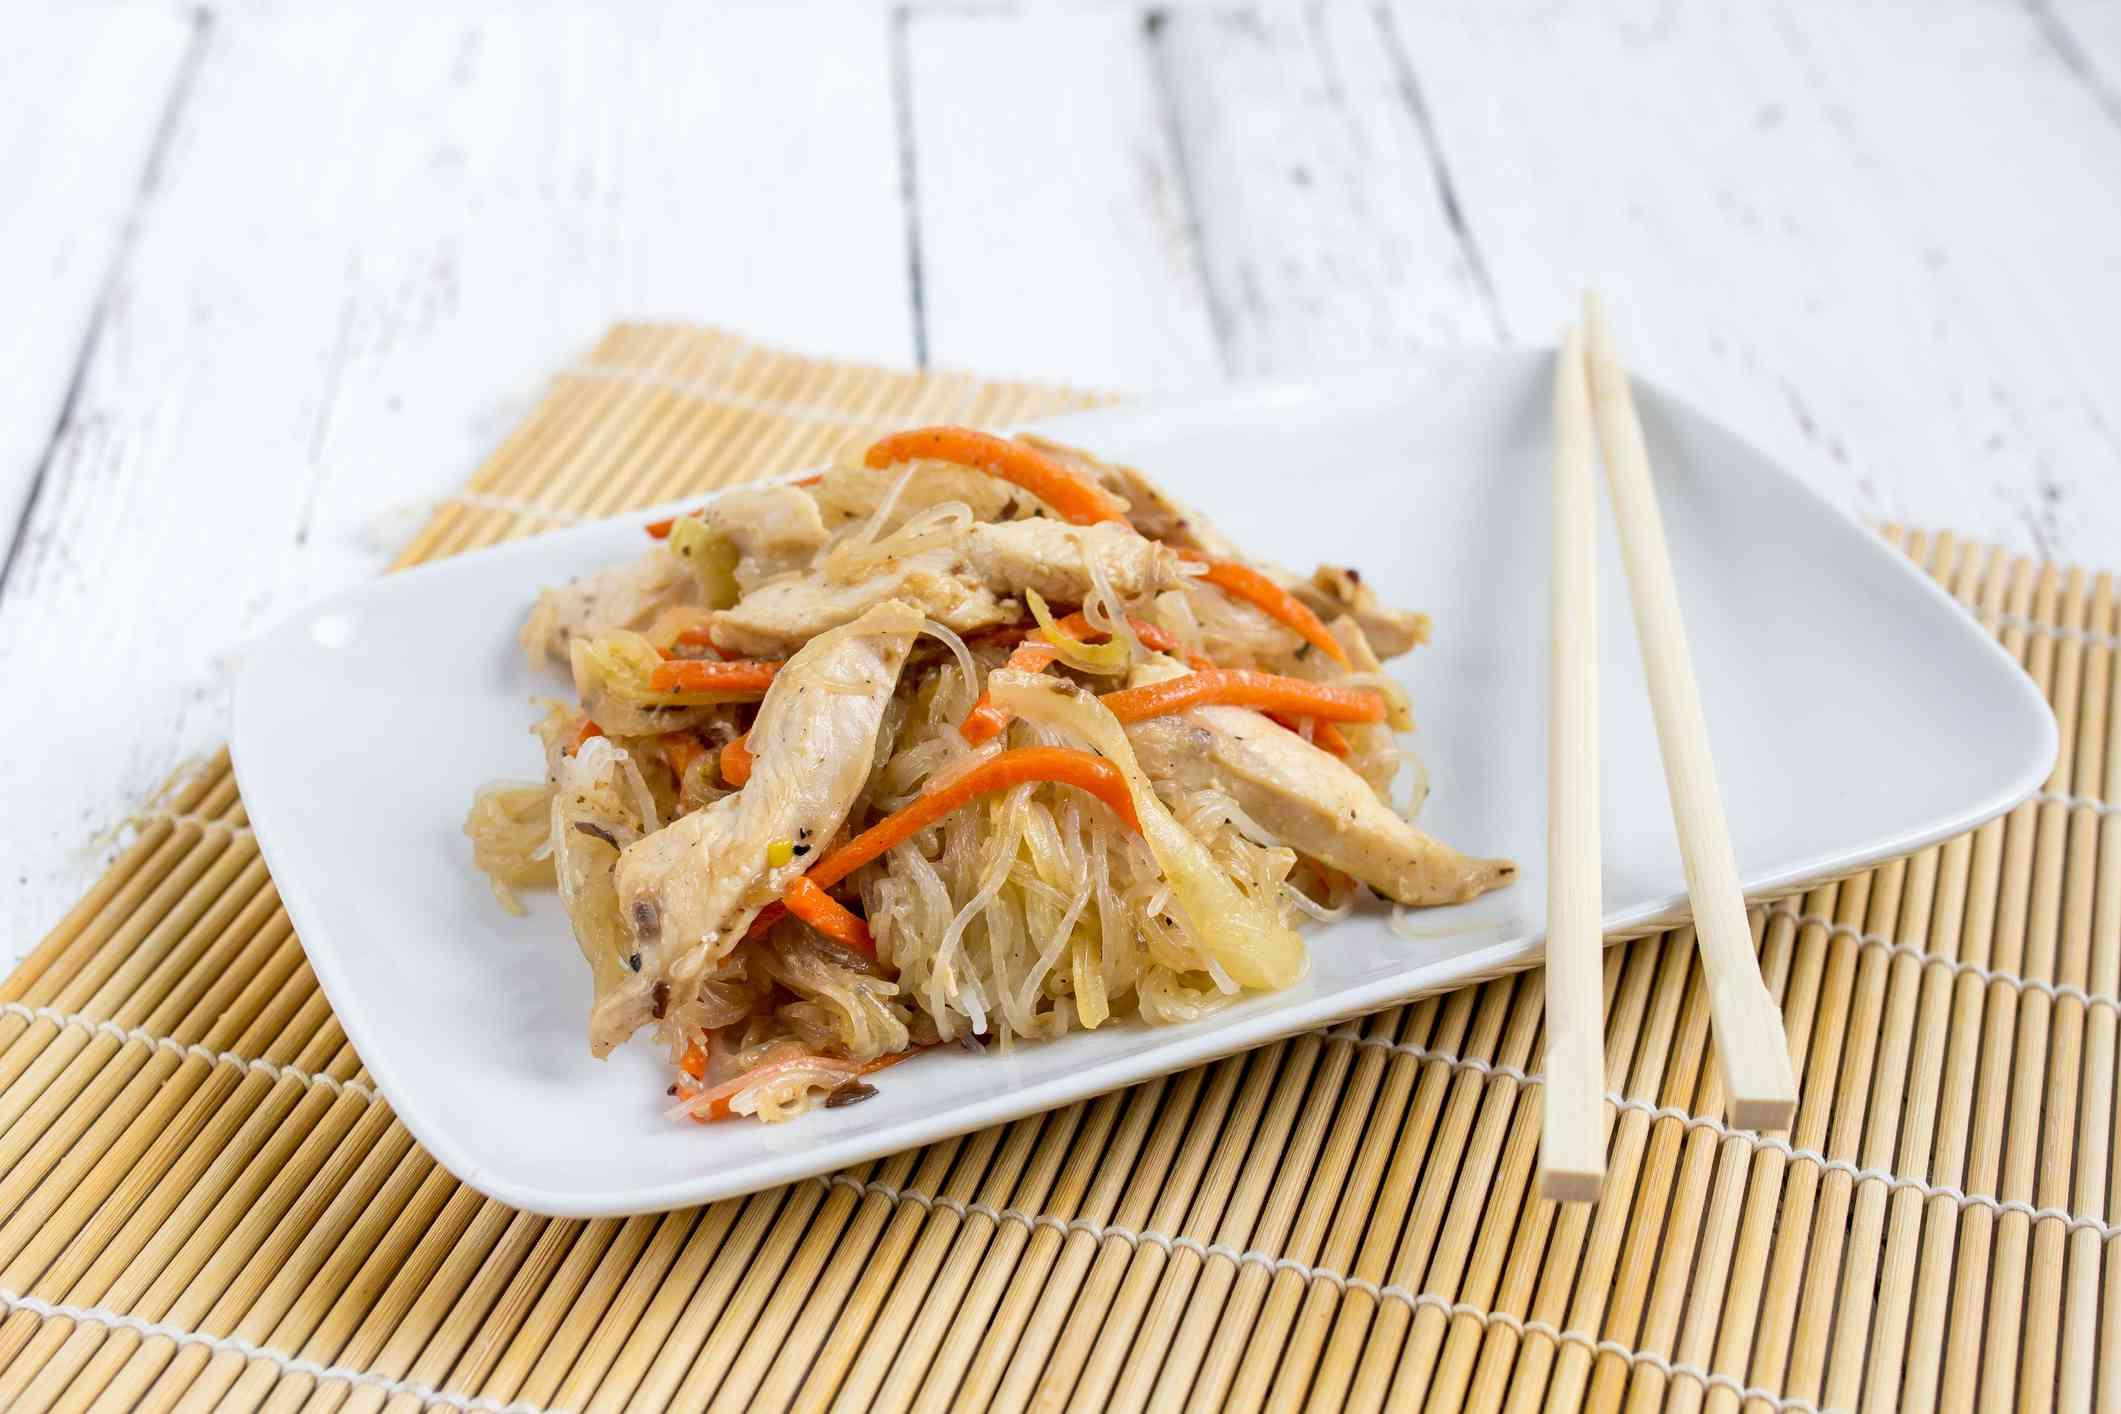 Chapchae (Stir-Fried Korean Noodles) on a white plate with chopsticks